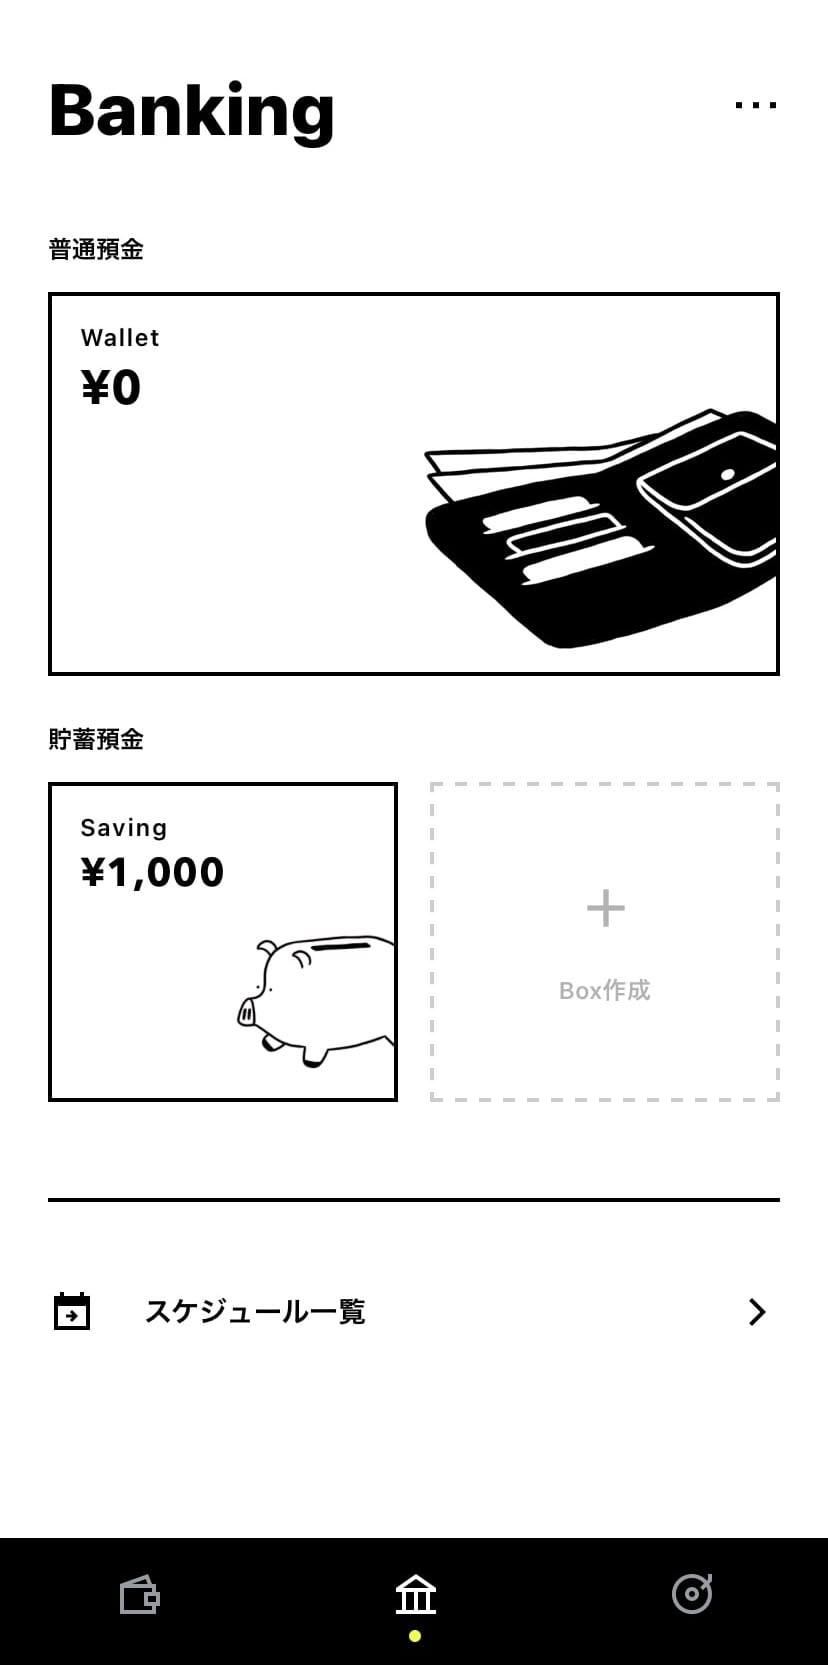 「Banking」画面。 紹介コードを入力して口座開設した場合、 翌日1時ごろに貯蓄預金に¥1,000が入金されます。 朝7時ころにアプリ、メールに通知がきます。